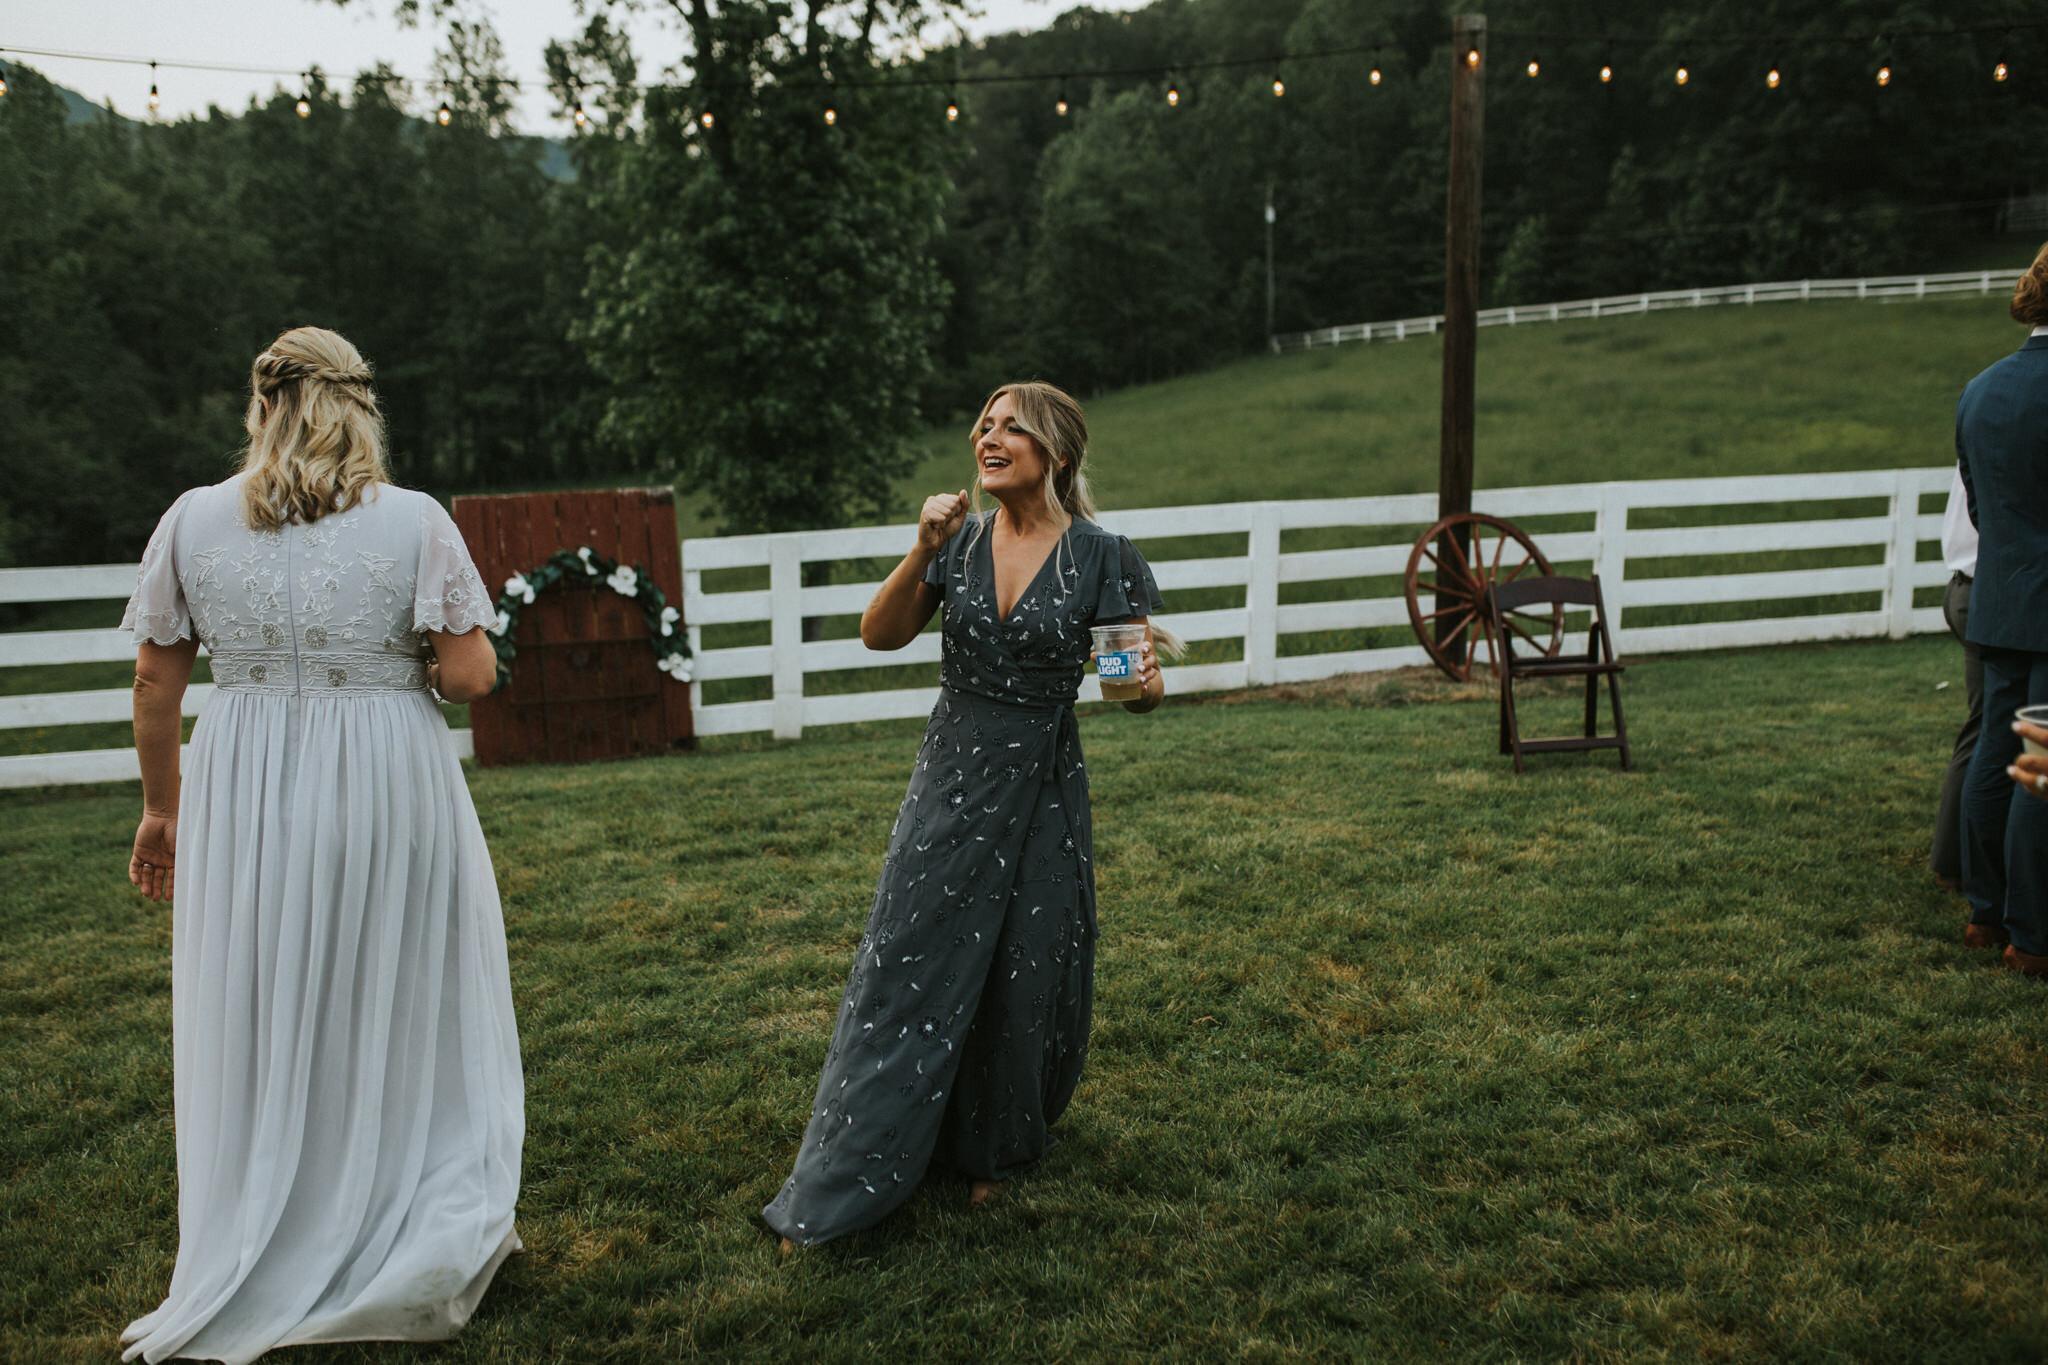 KateMatt-North-Georgia-Wedding-Photographer-Mountain-Laurel-Farm-151.jpg